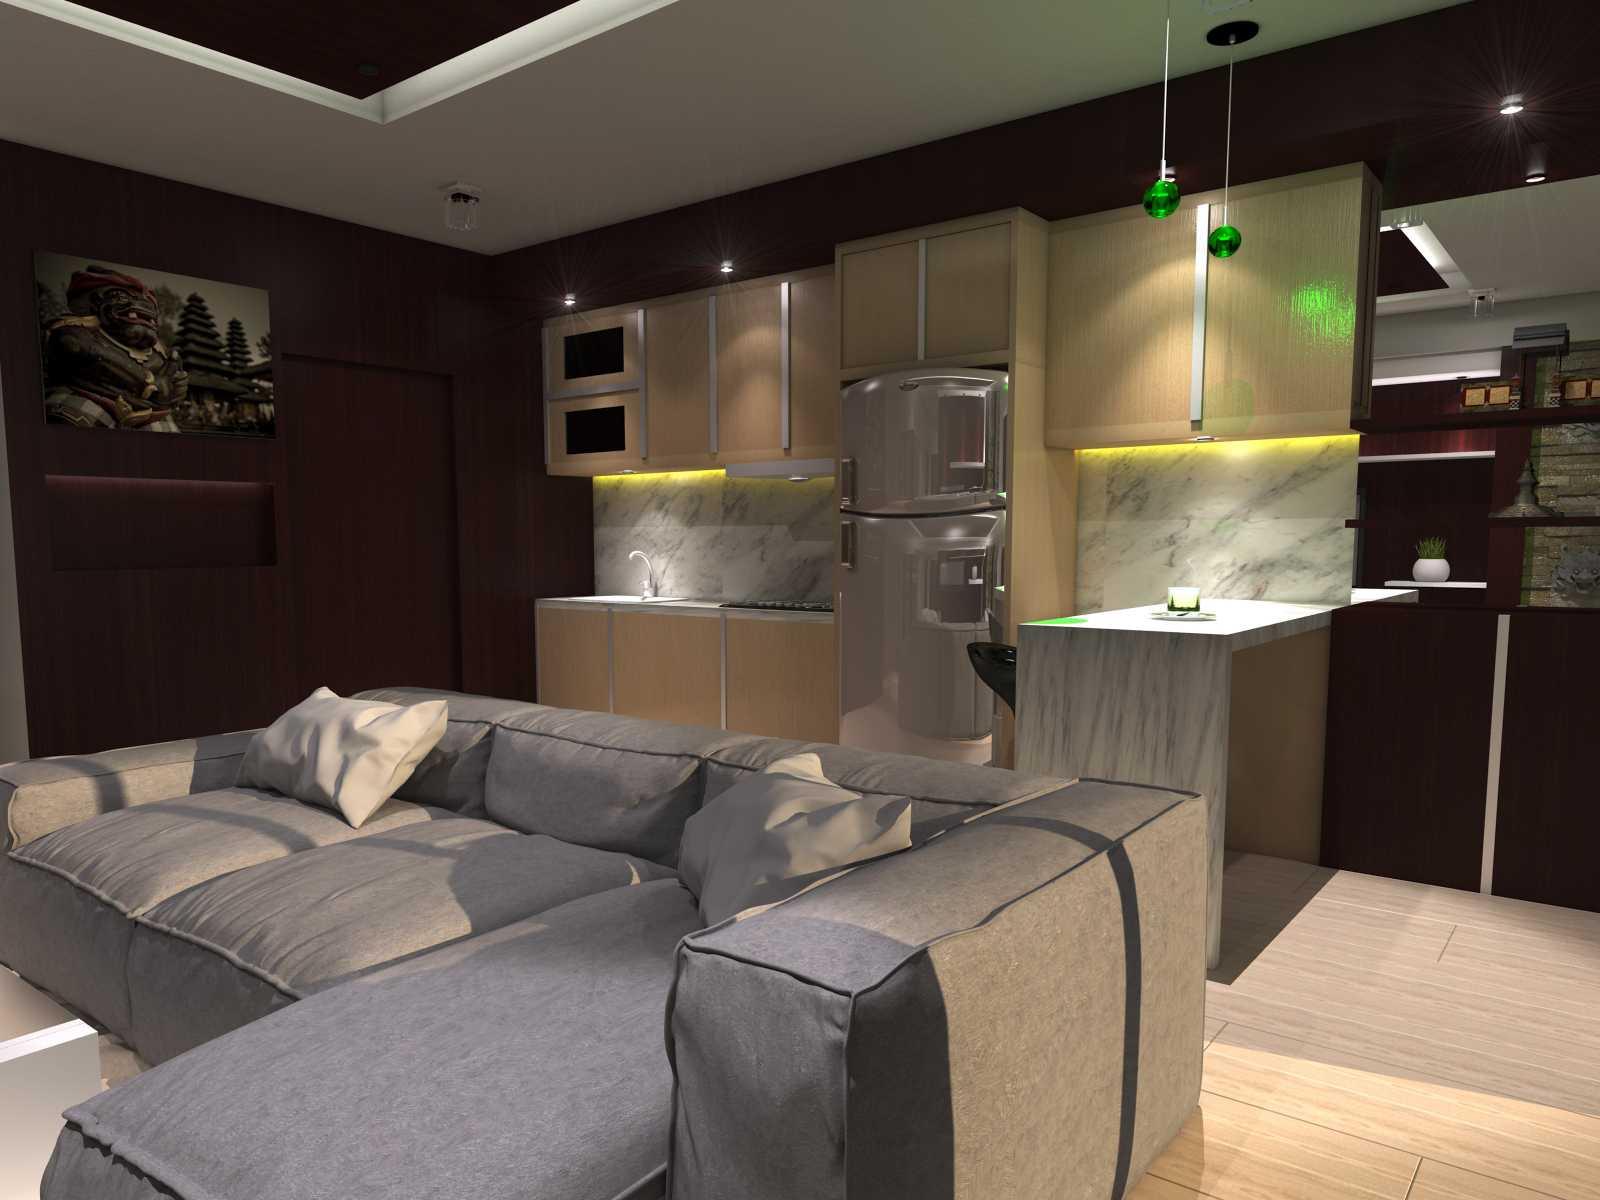 Rw Concept Apartment Admiral (Aspen) Jakarta, Daerah Khusus Ibukota Jakarta, Indonesia Jakarta, Daerah Khusus Ibukota Jakarta, Indonesia Kitchen View Asian  45284